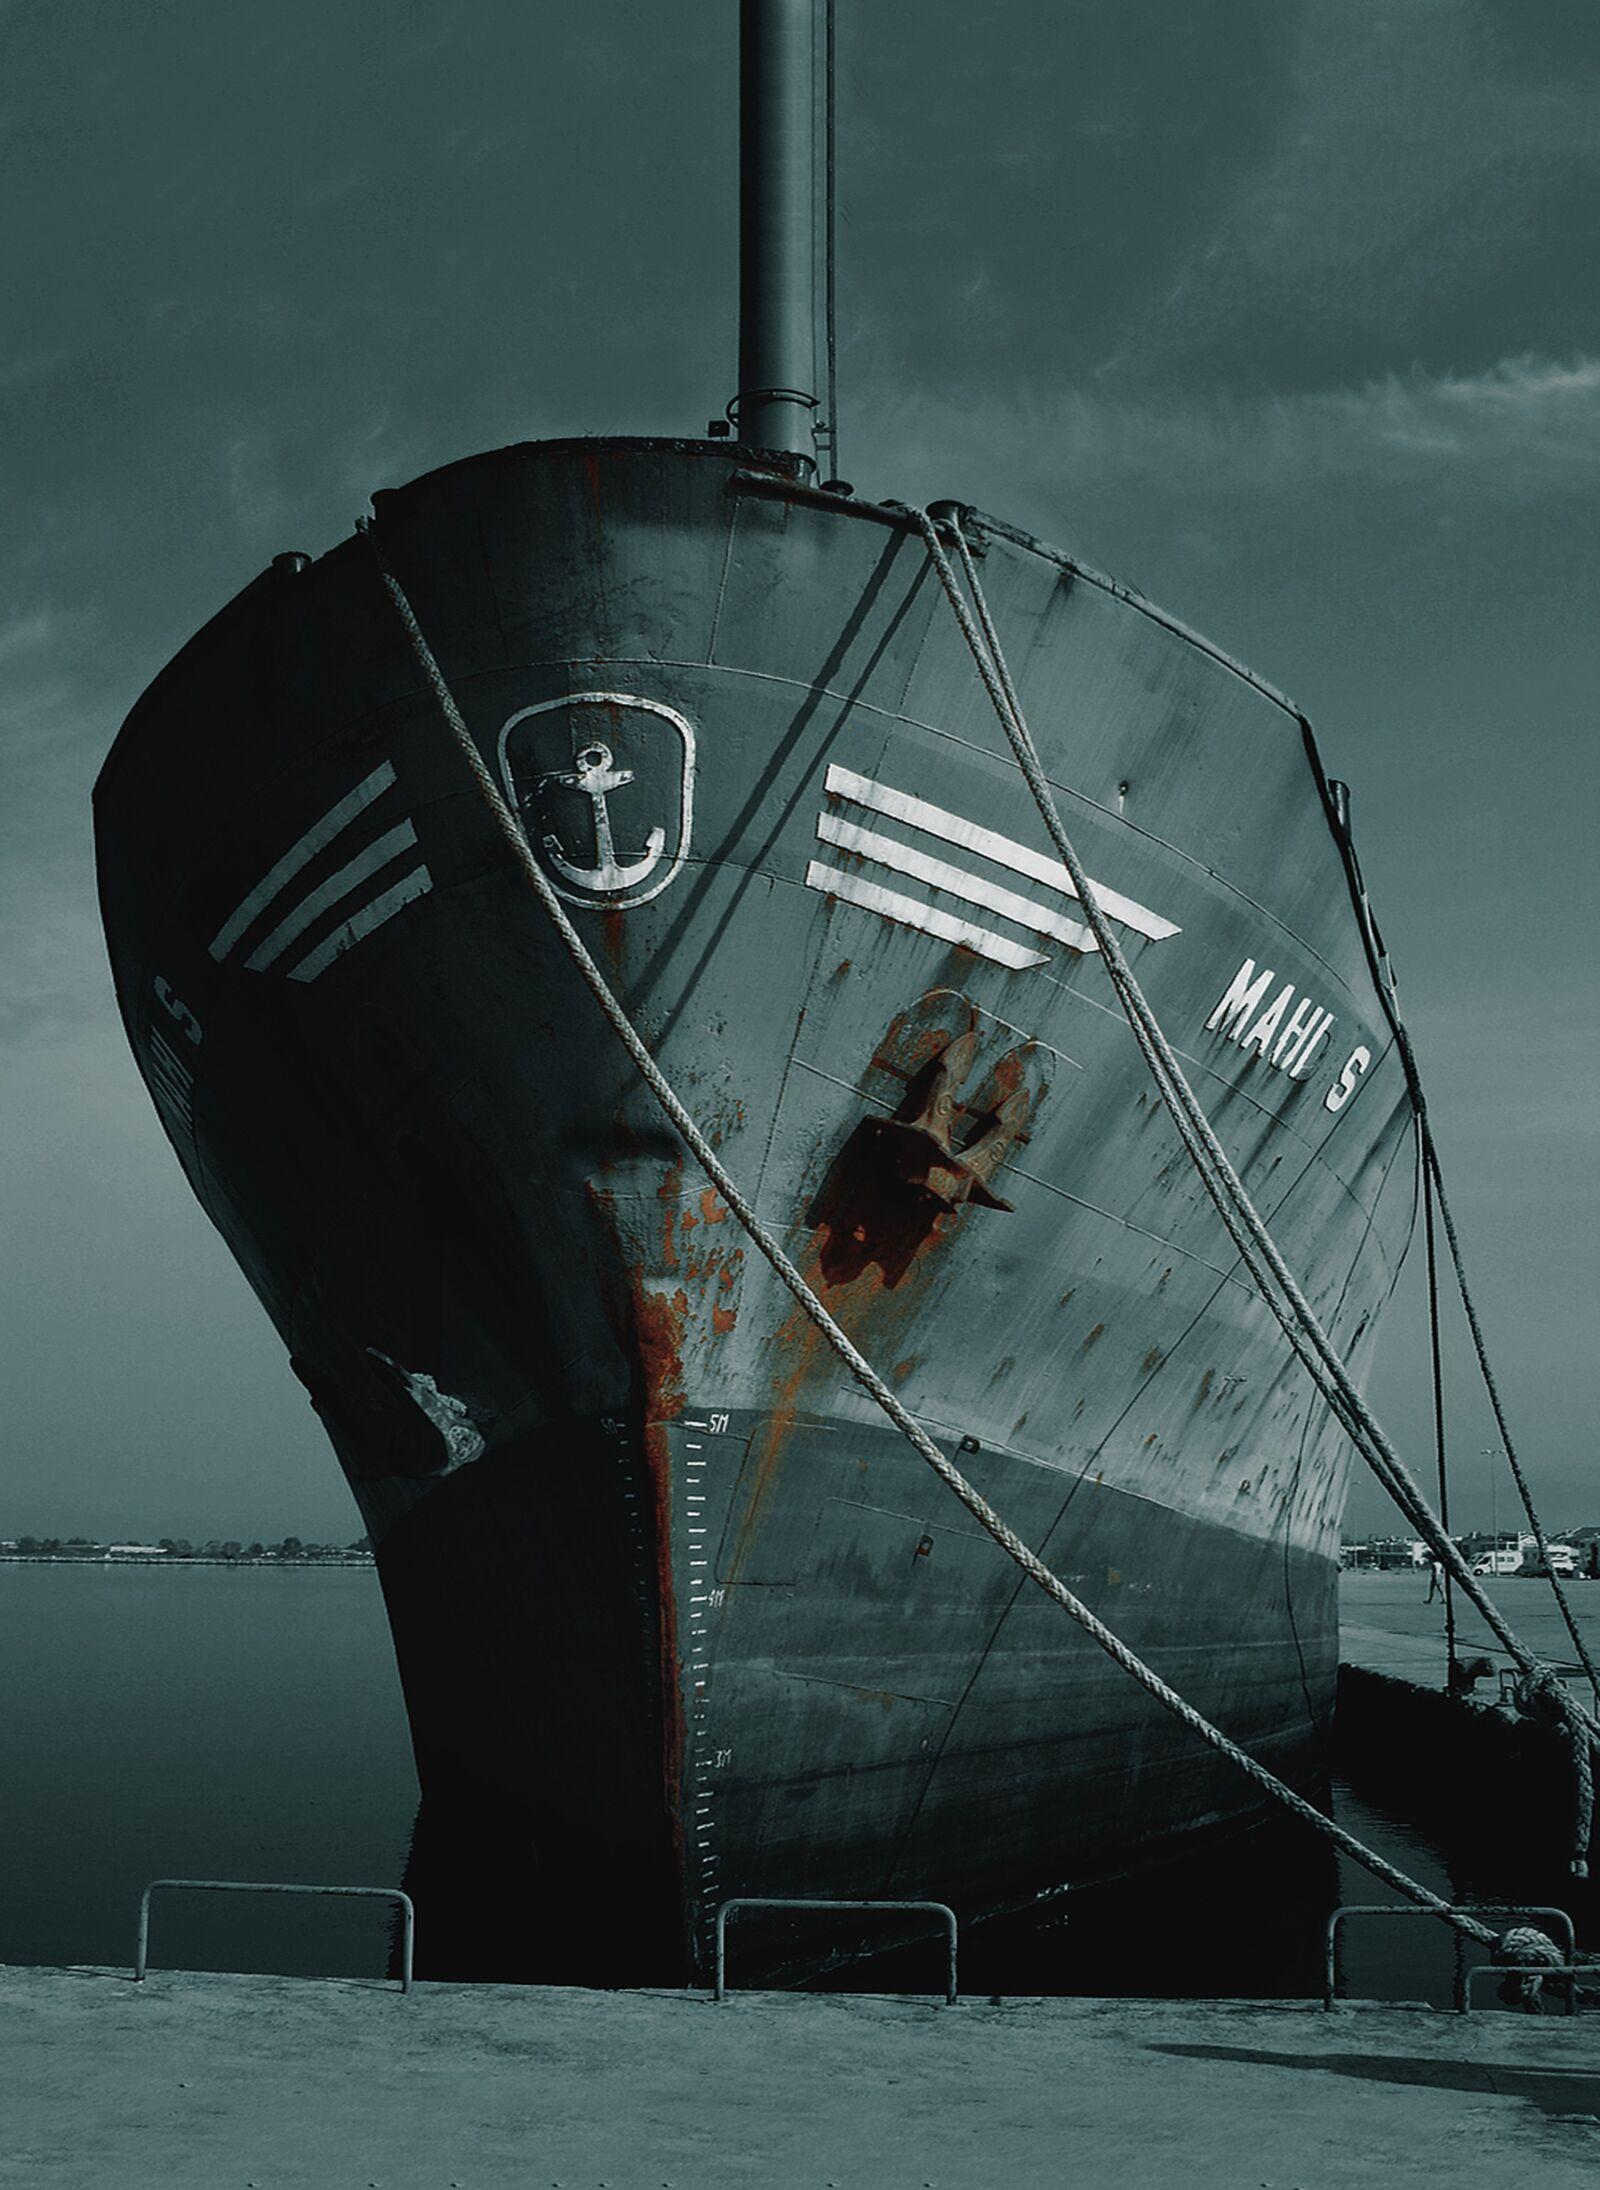 ship, port, steed